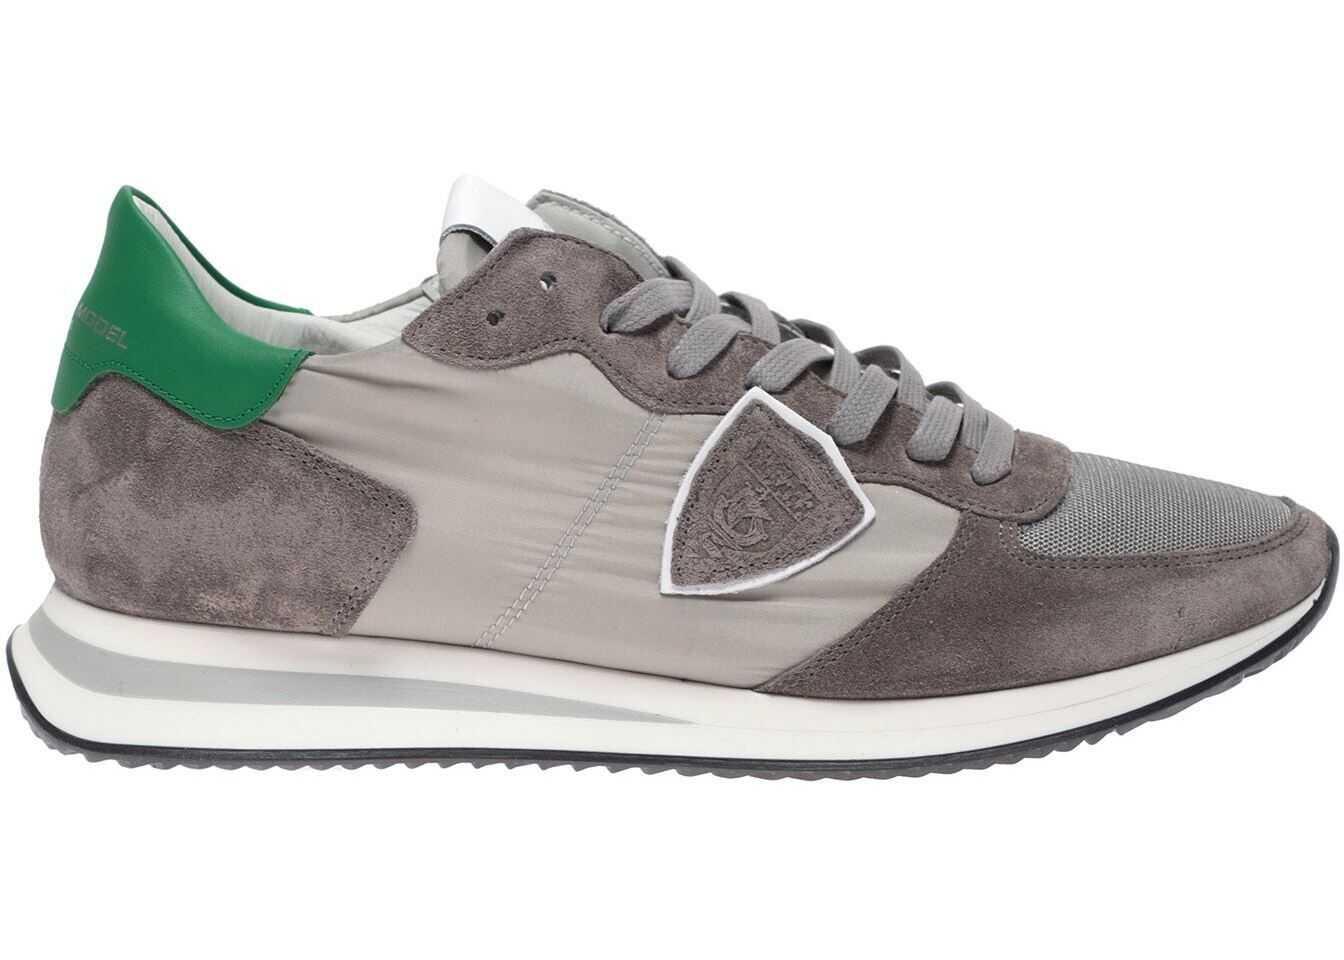 Philippe Model Trpx Mondial Sneakers In Grey With Green Heel Tab Grey